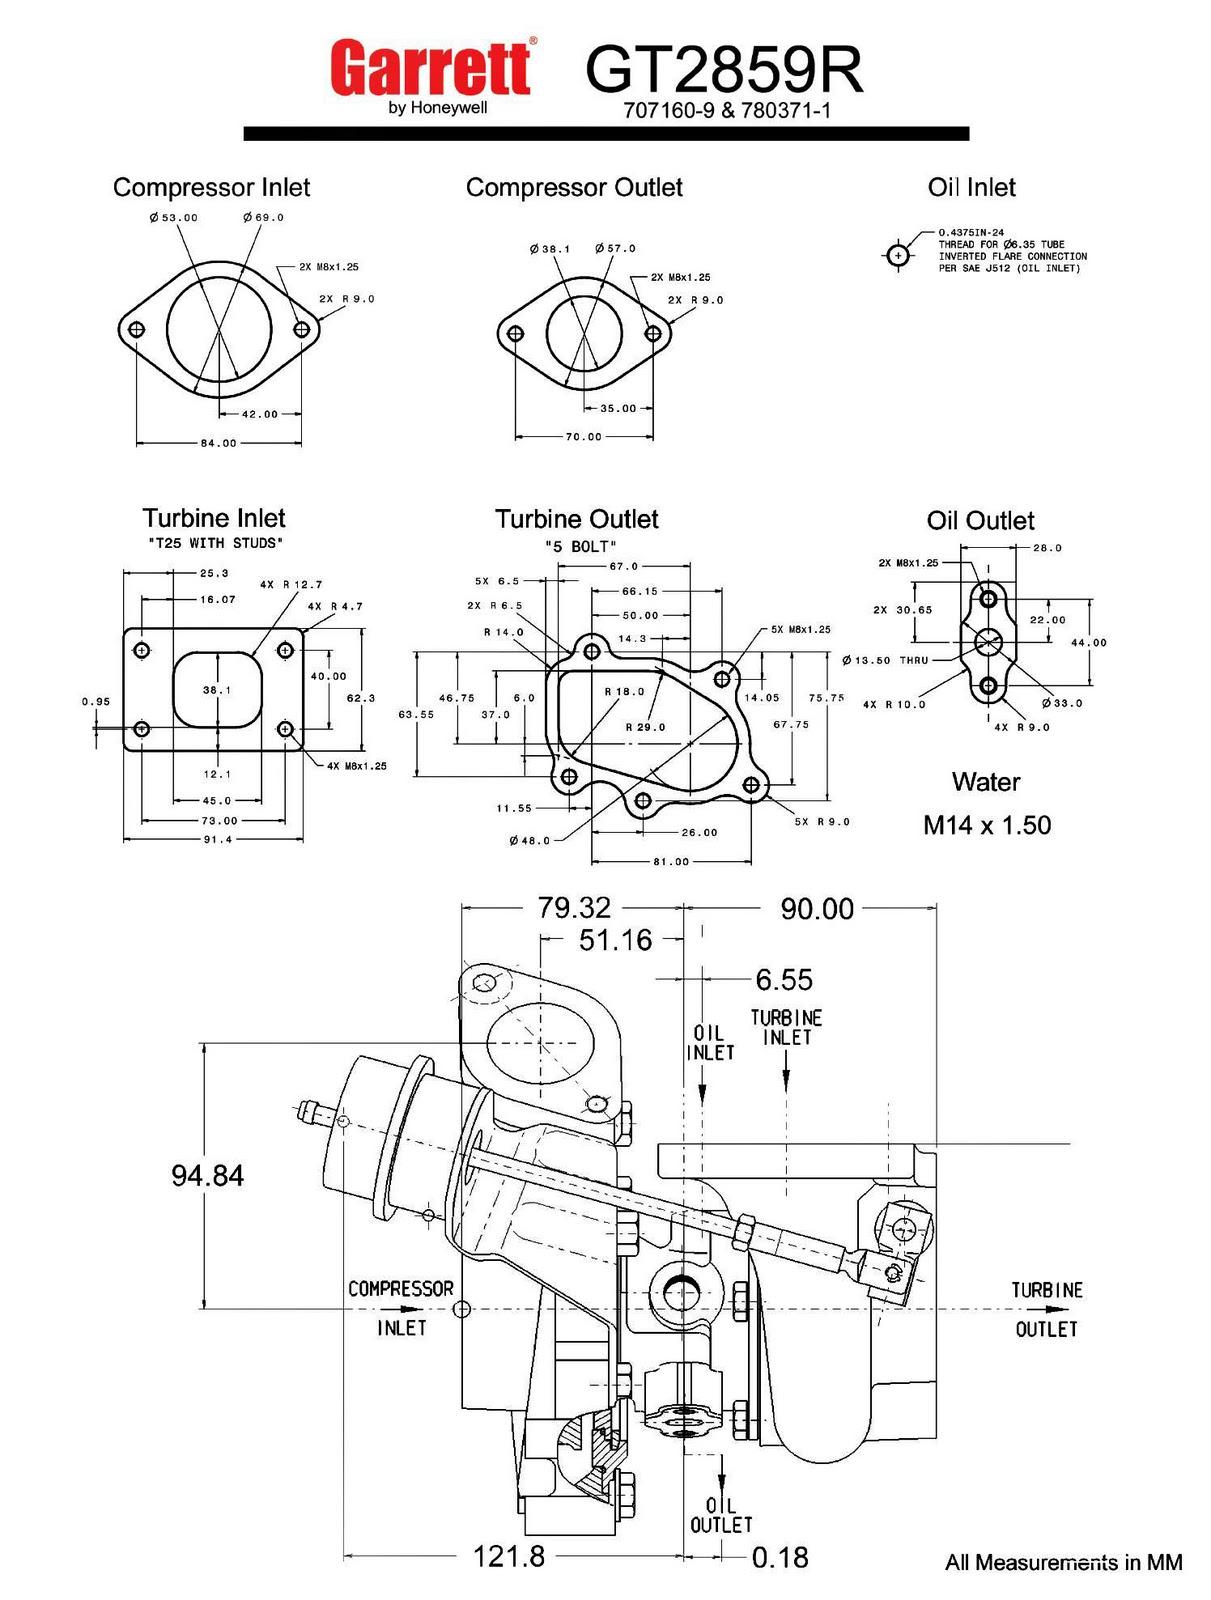 hight resolution of garrett gt28r turbo gt2859r dual ball bearing measurements in mm turbocharger flanges diameter turbo flange honeywell 1496x1977